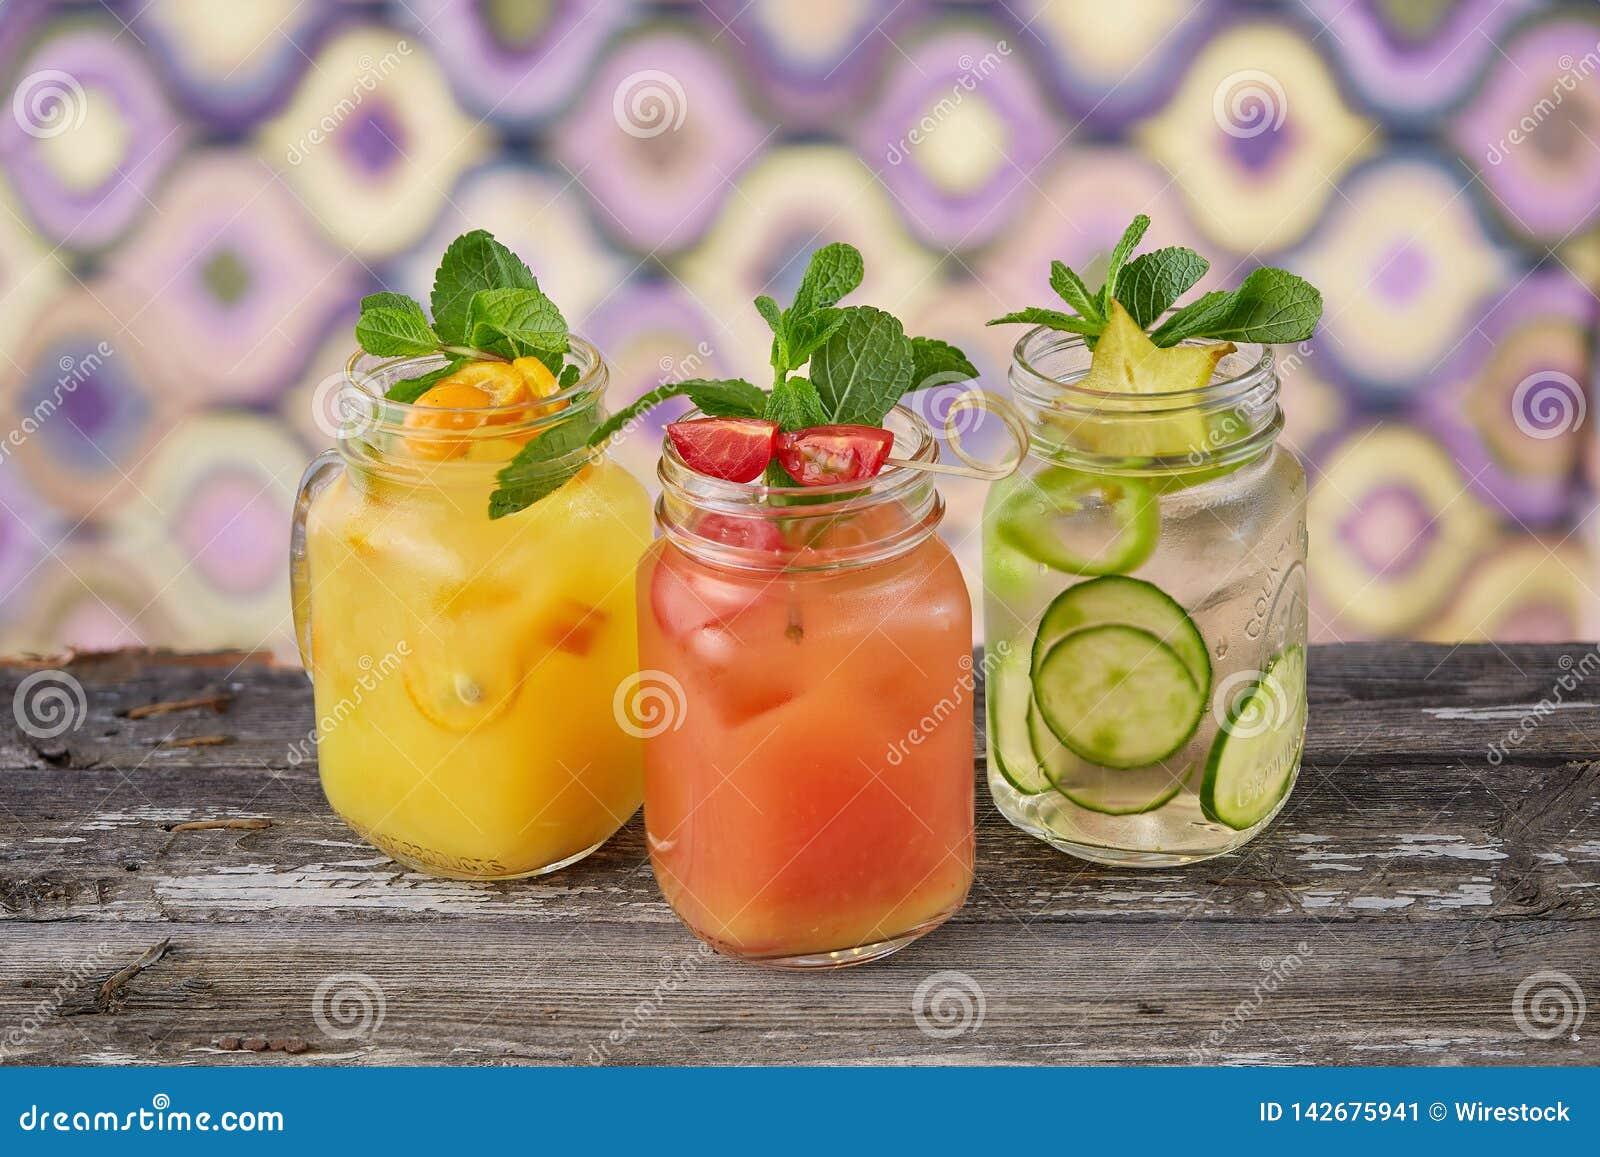 Colorful jars with lemonade